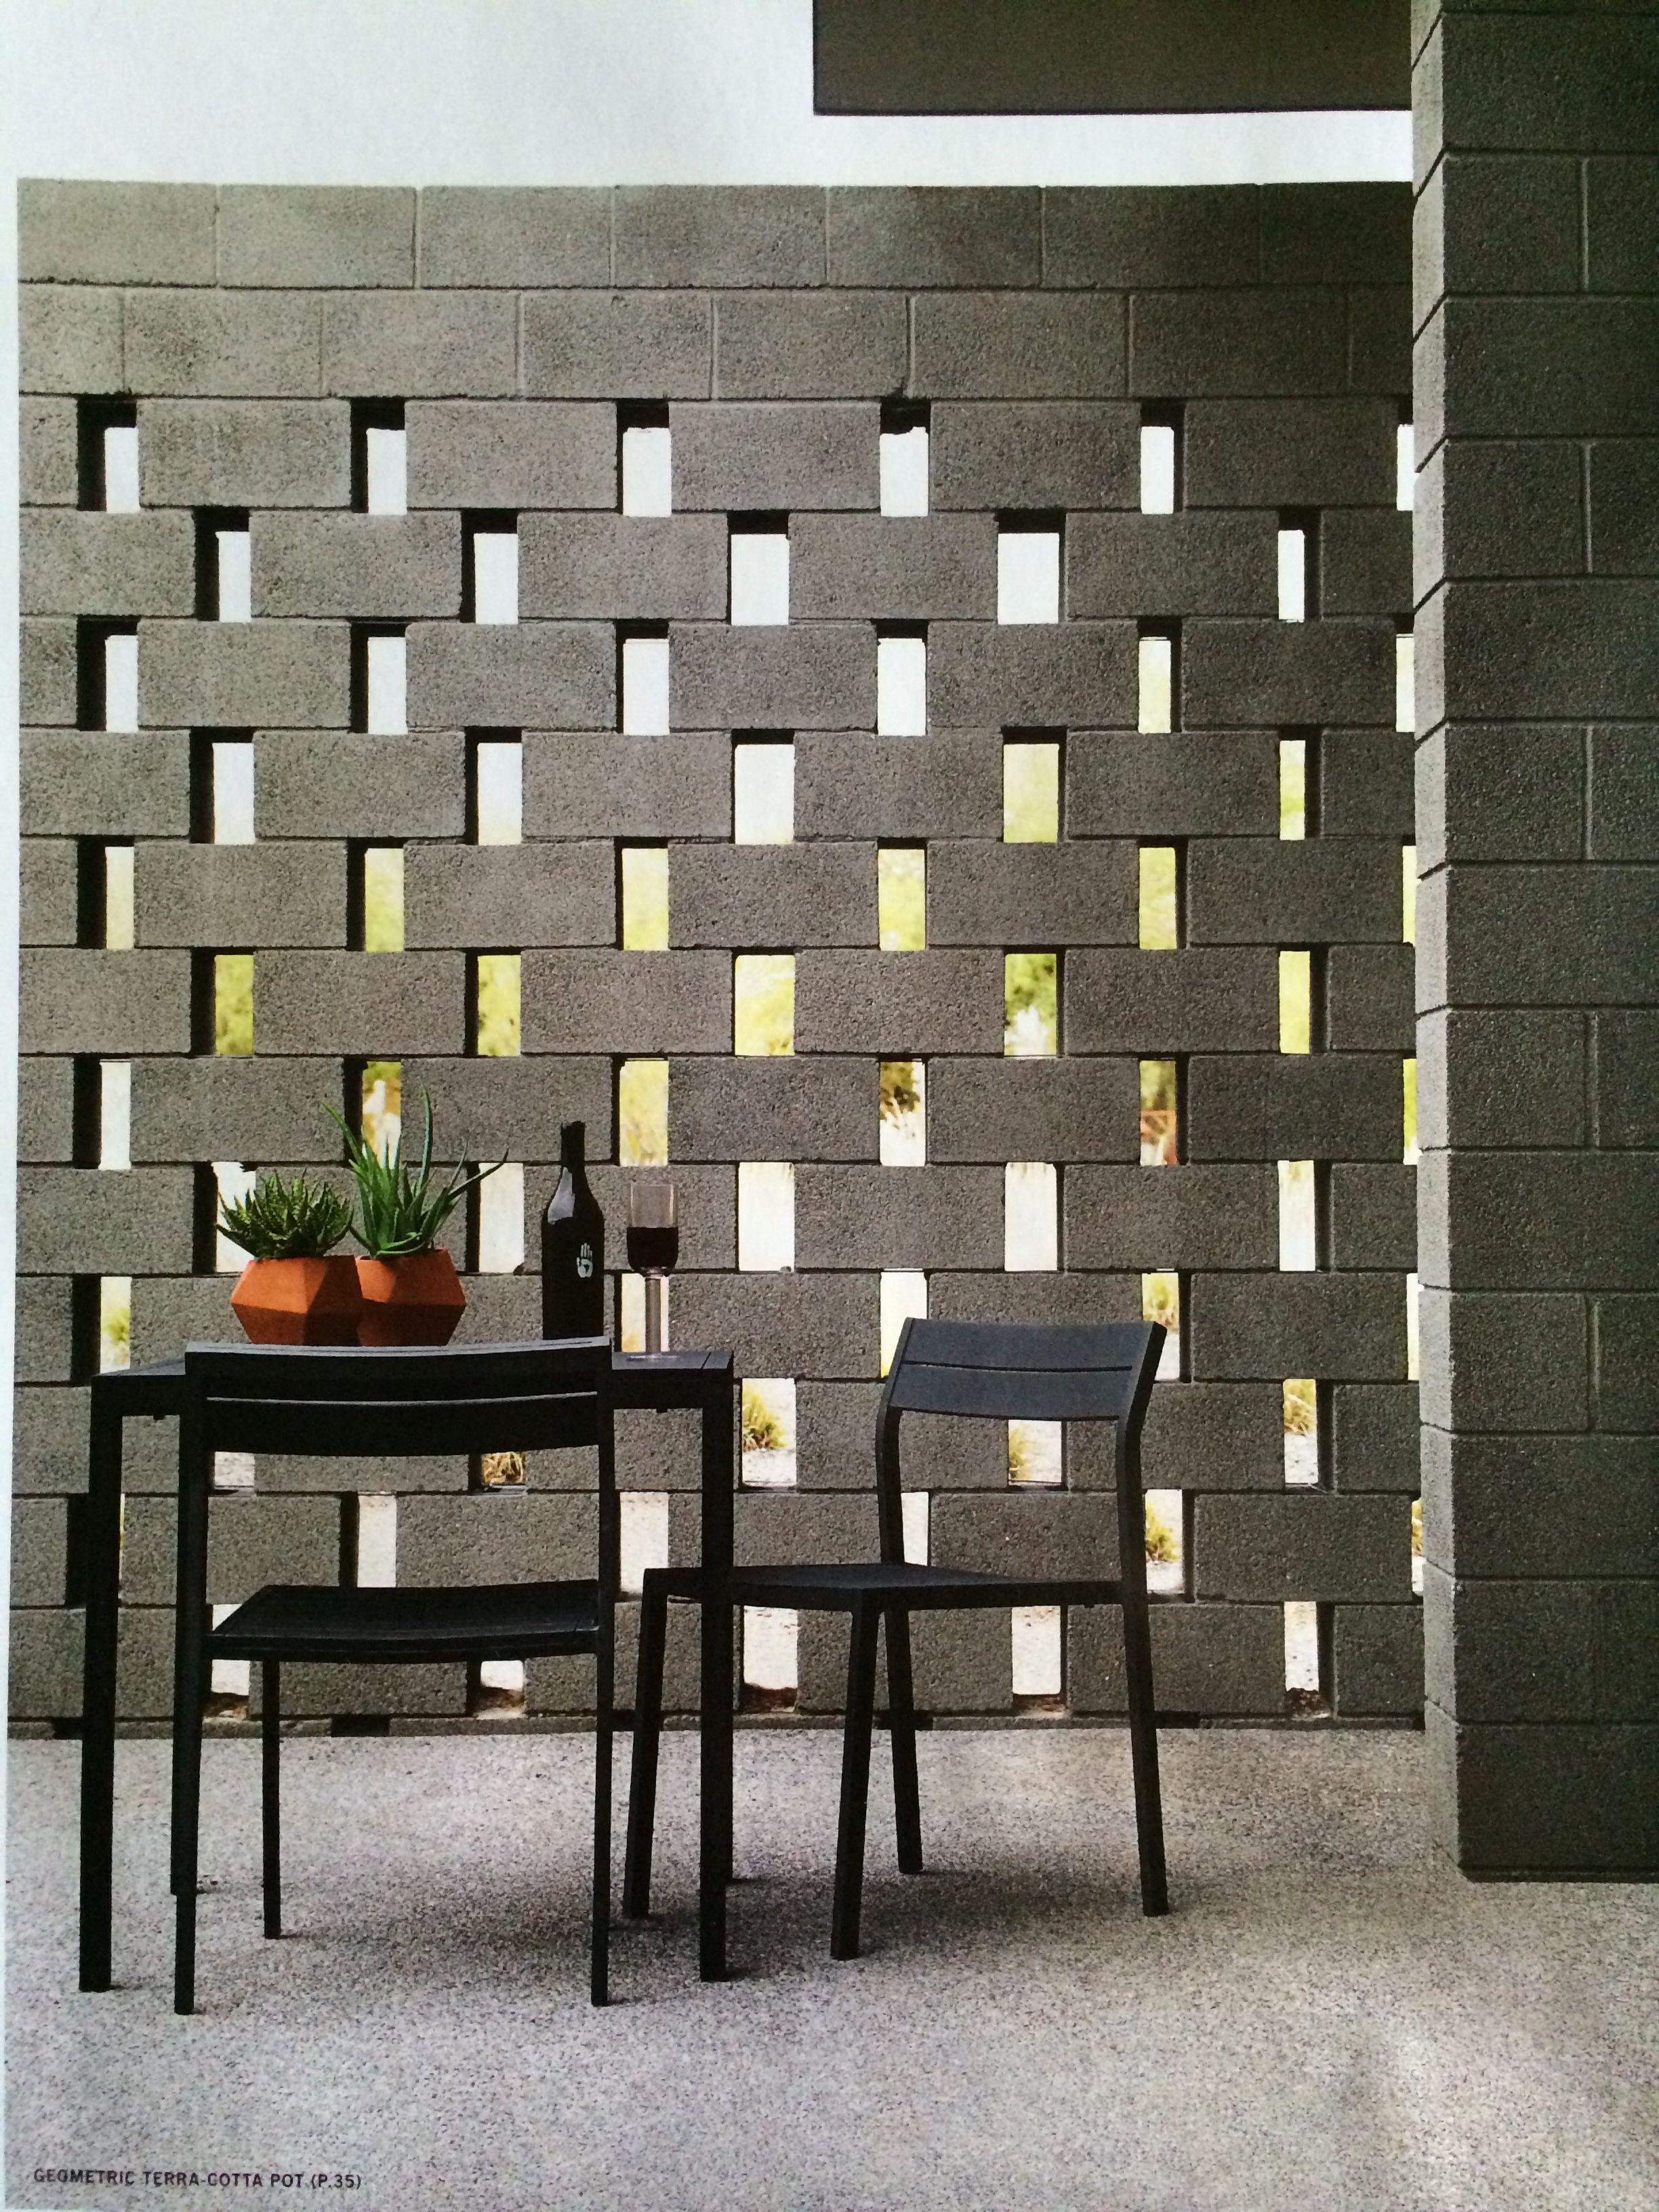 Concrete Block Trellis For Outdoor Wall Cinder Block Walls Concrete Block Walls Breeze Block Wall